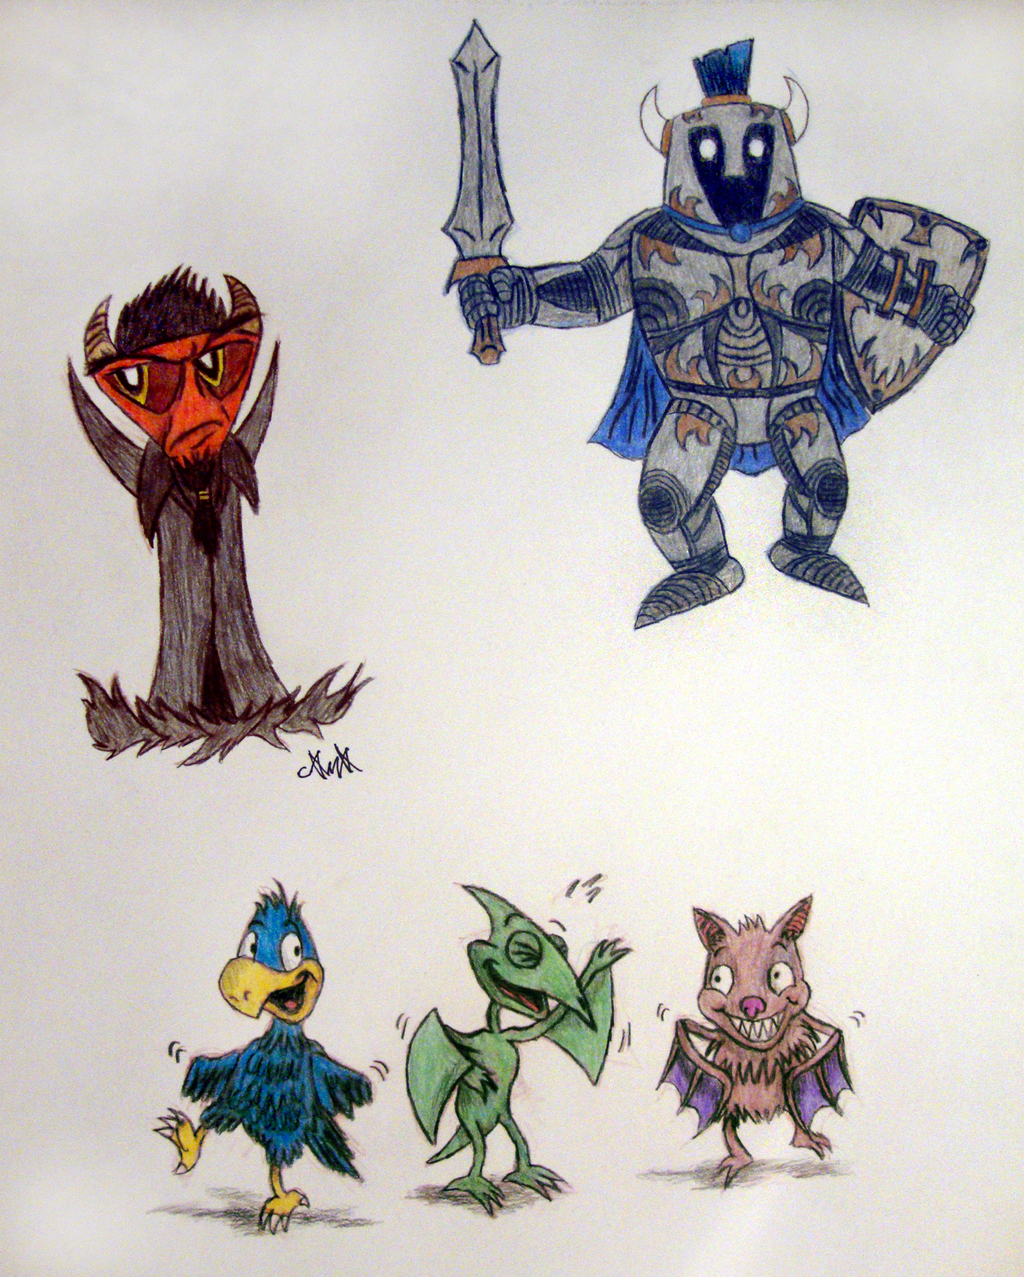 Fantasy characters 02 by gagaman92